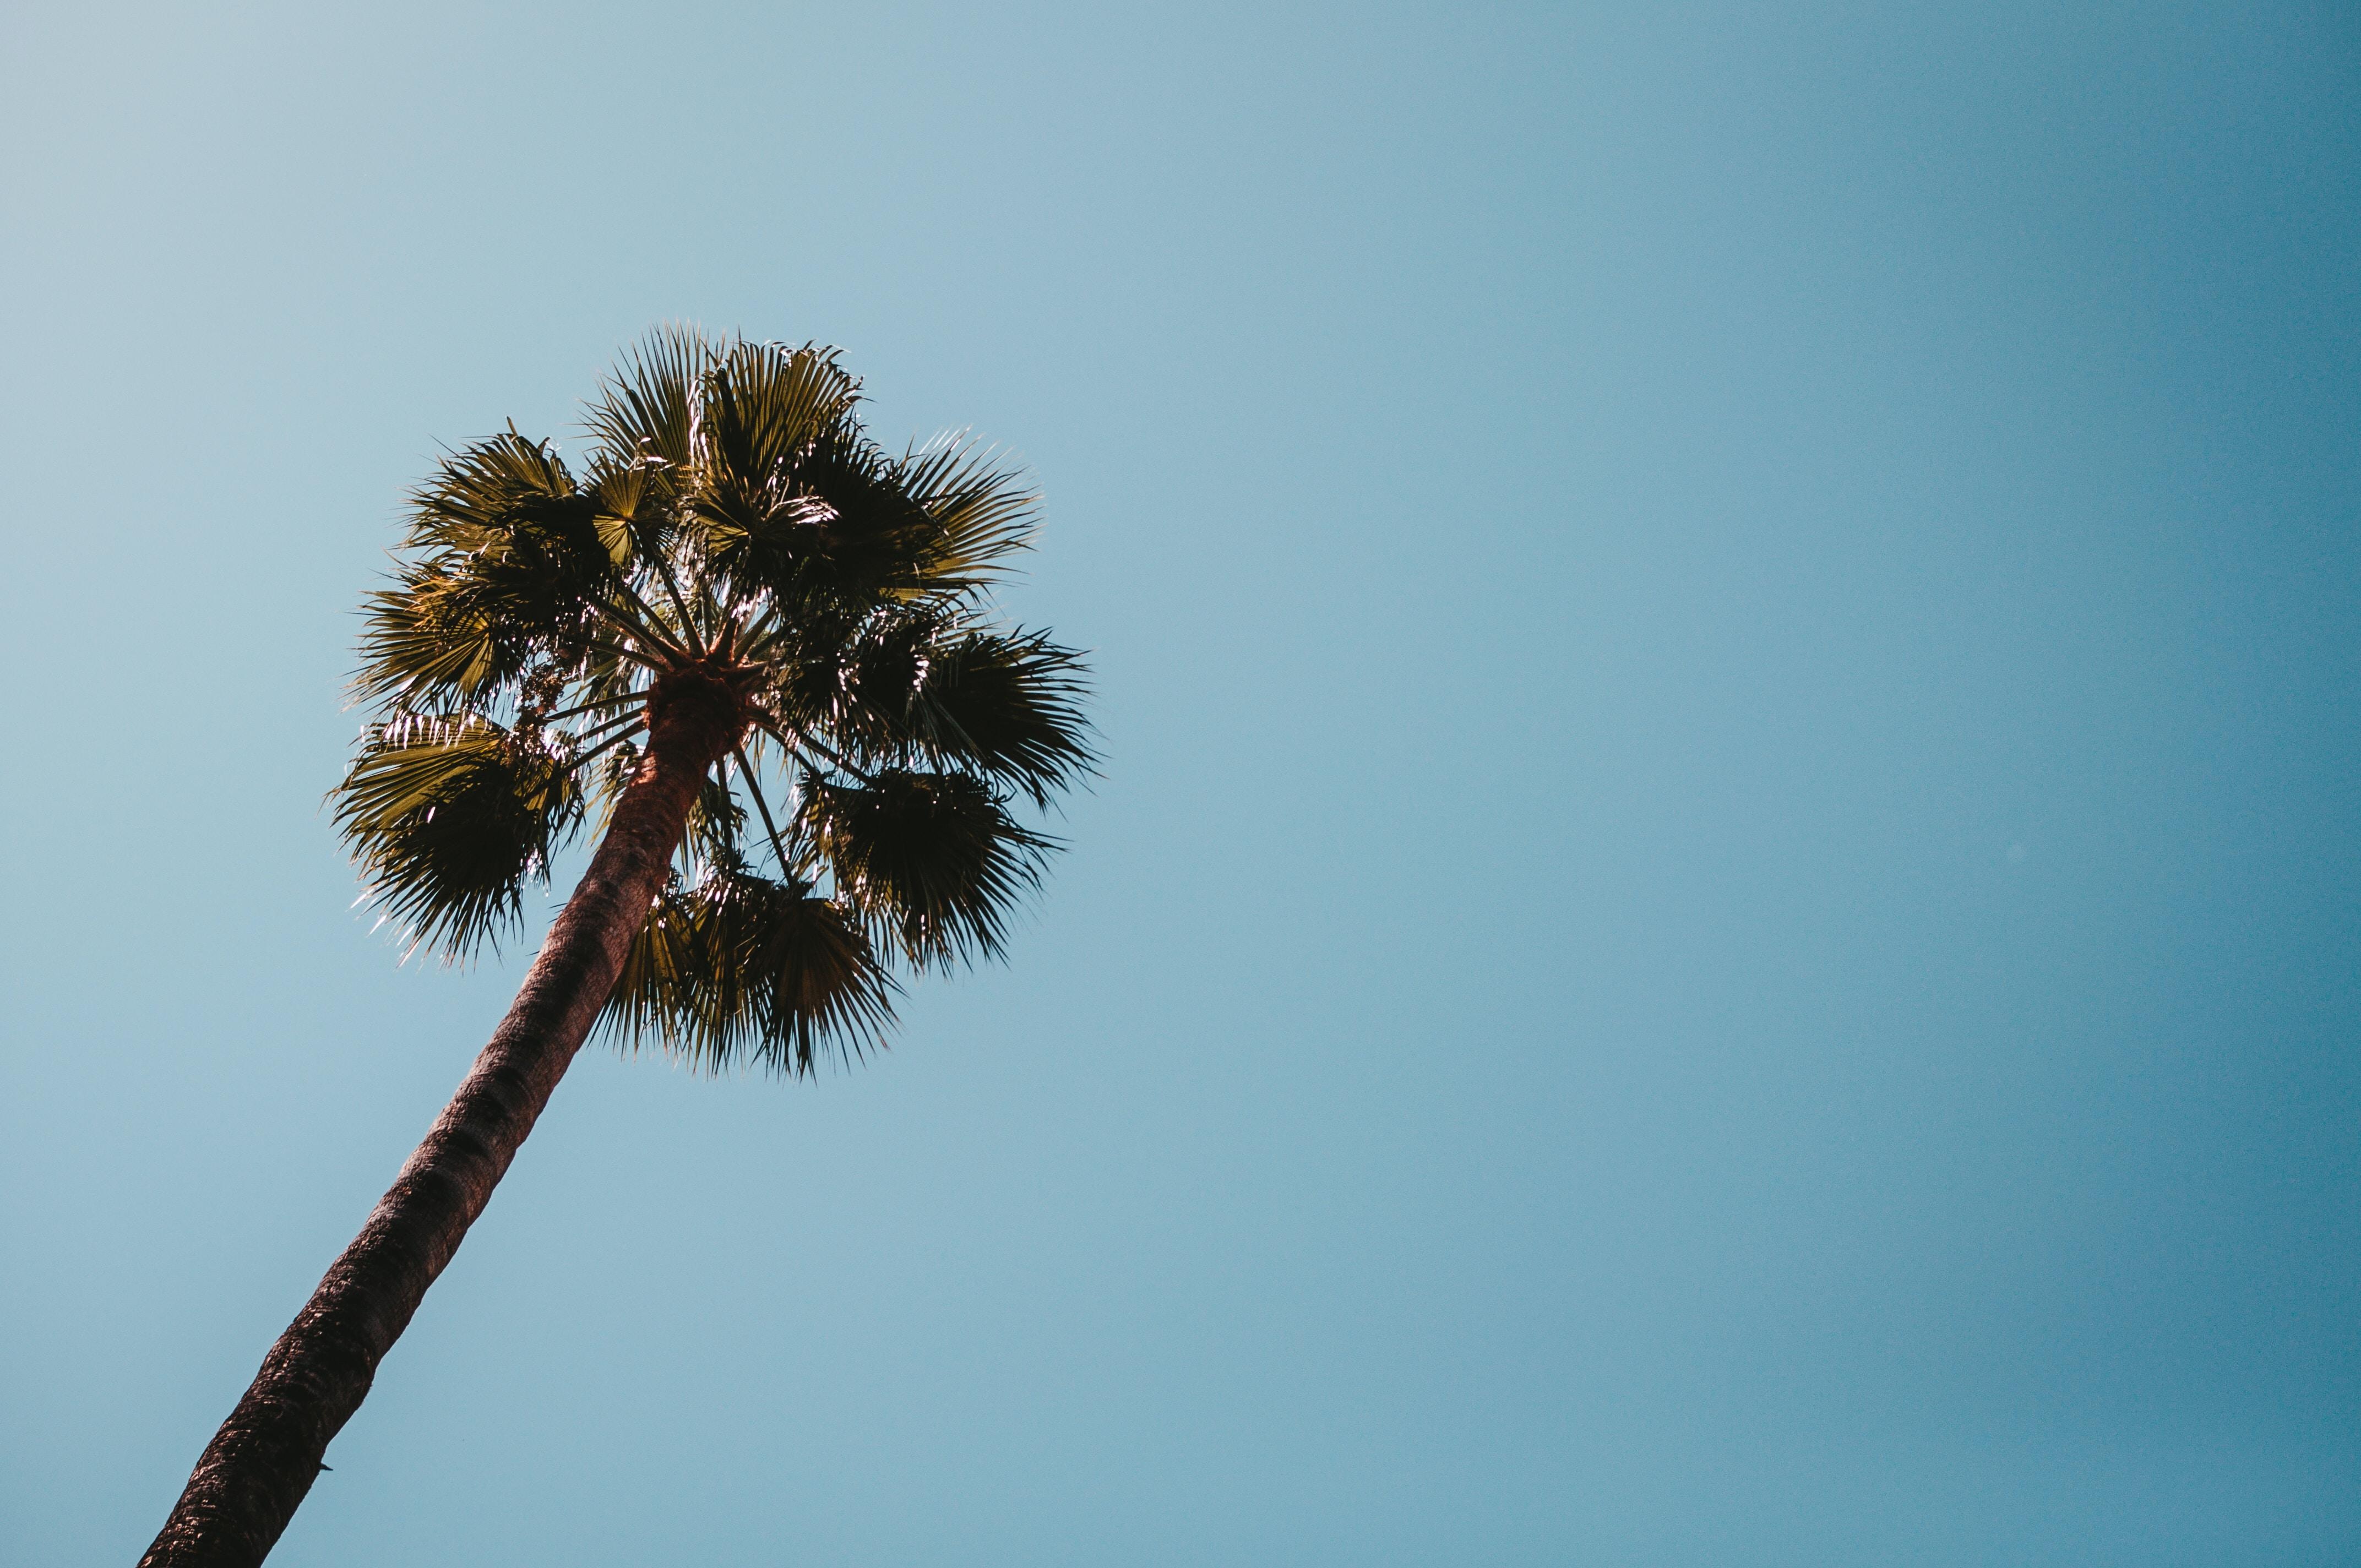 low angle photo of palm tree